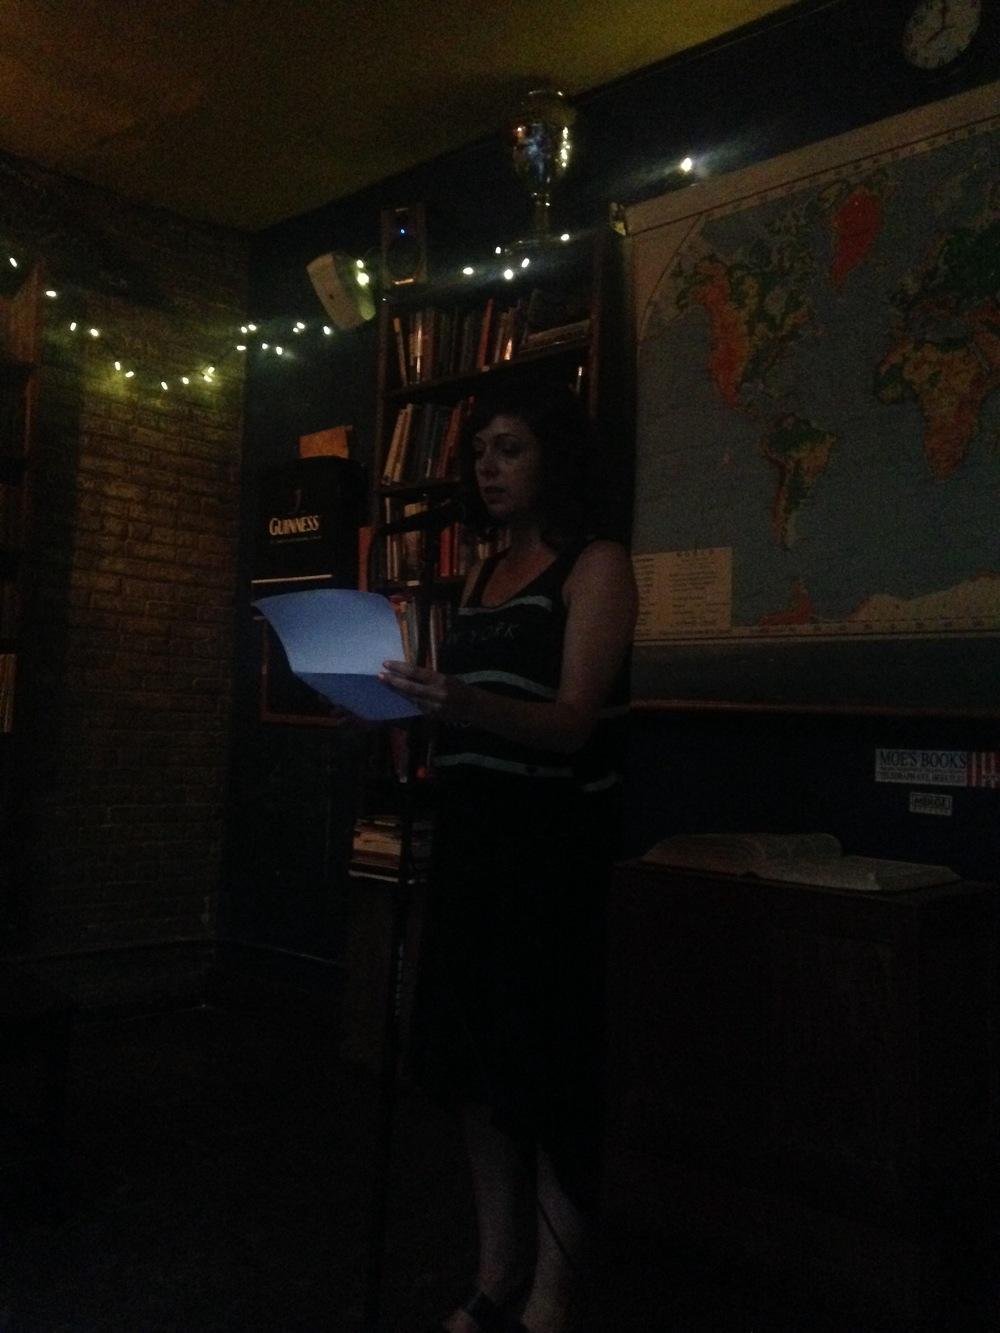 UNY Editor Nicole Haroutunian